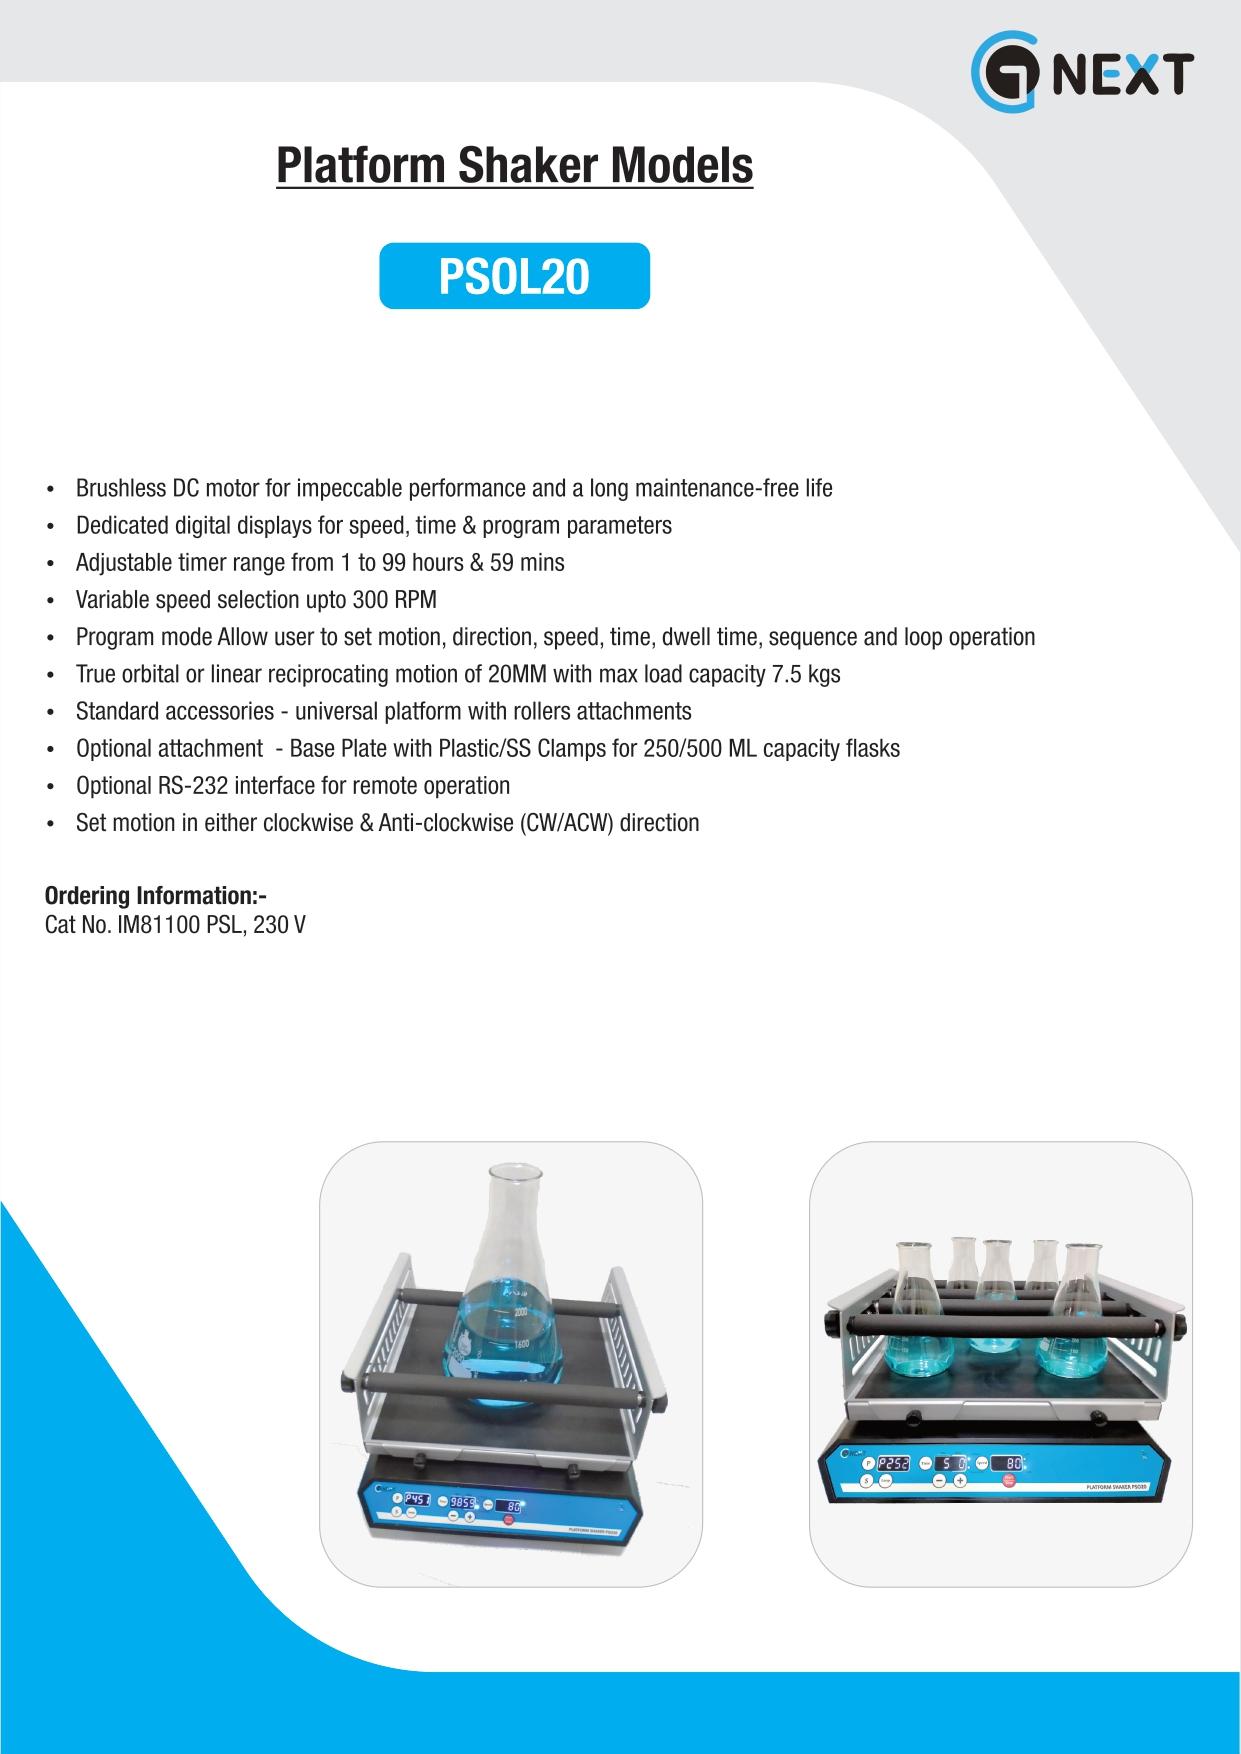 Platform Shakers